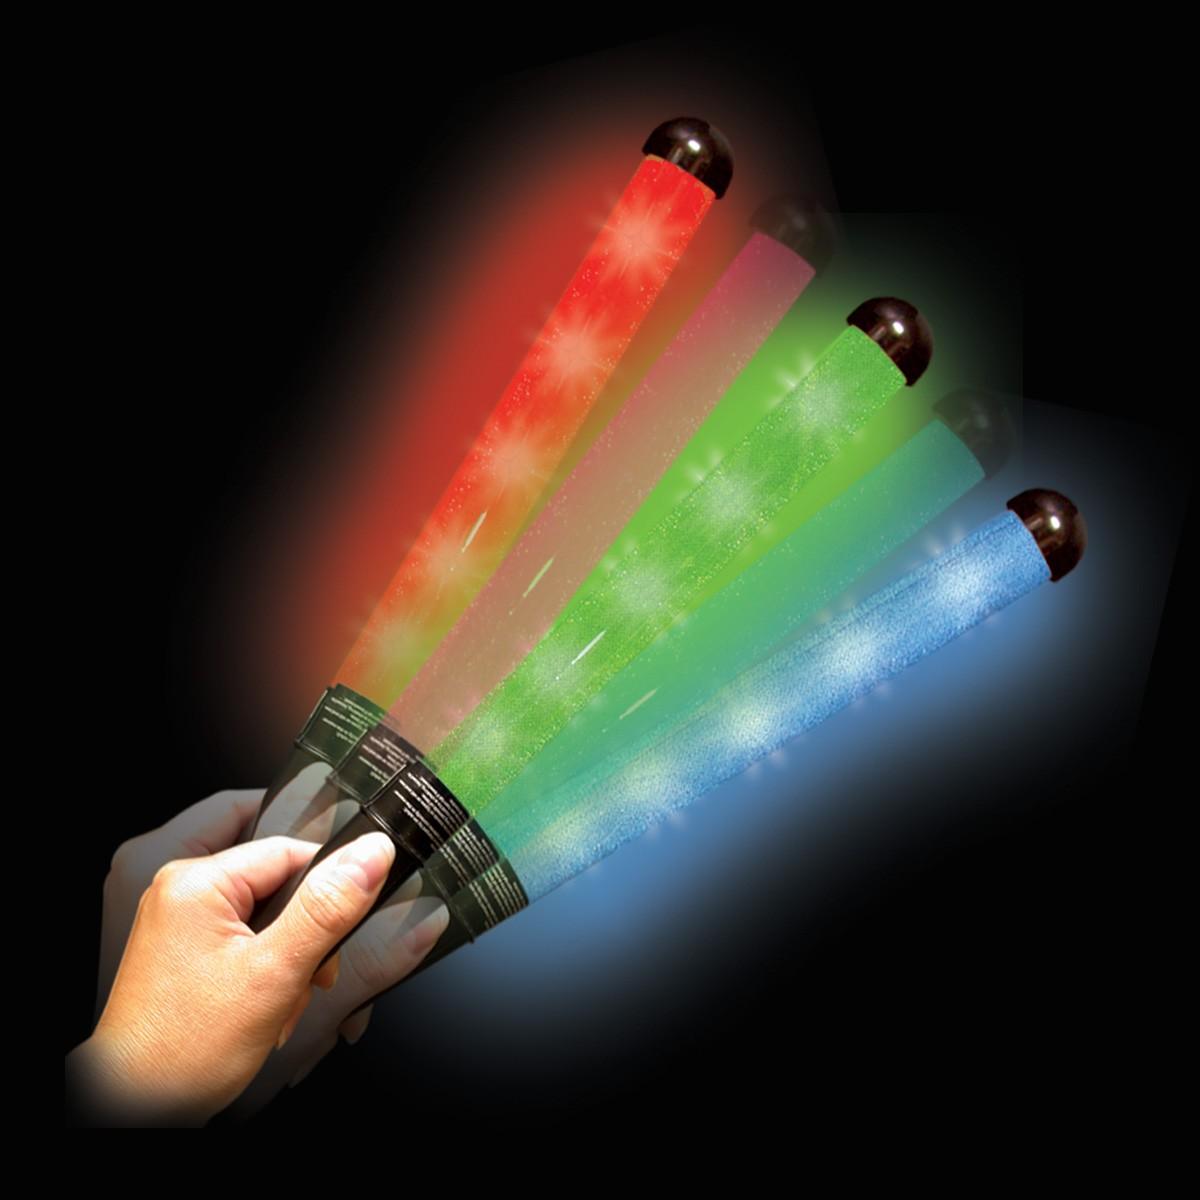 12 INCH LED PATROL WAND